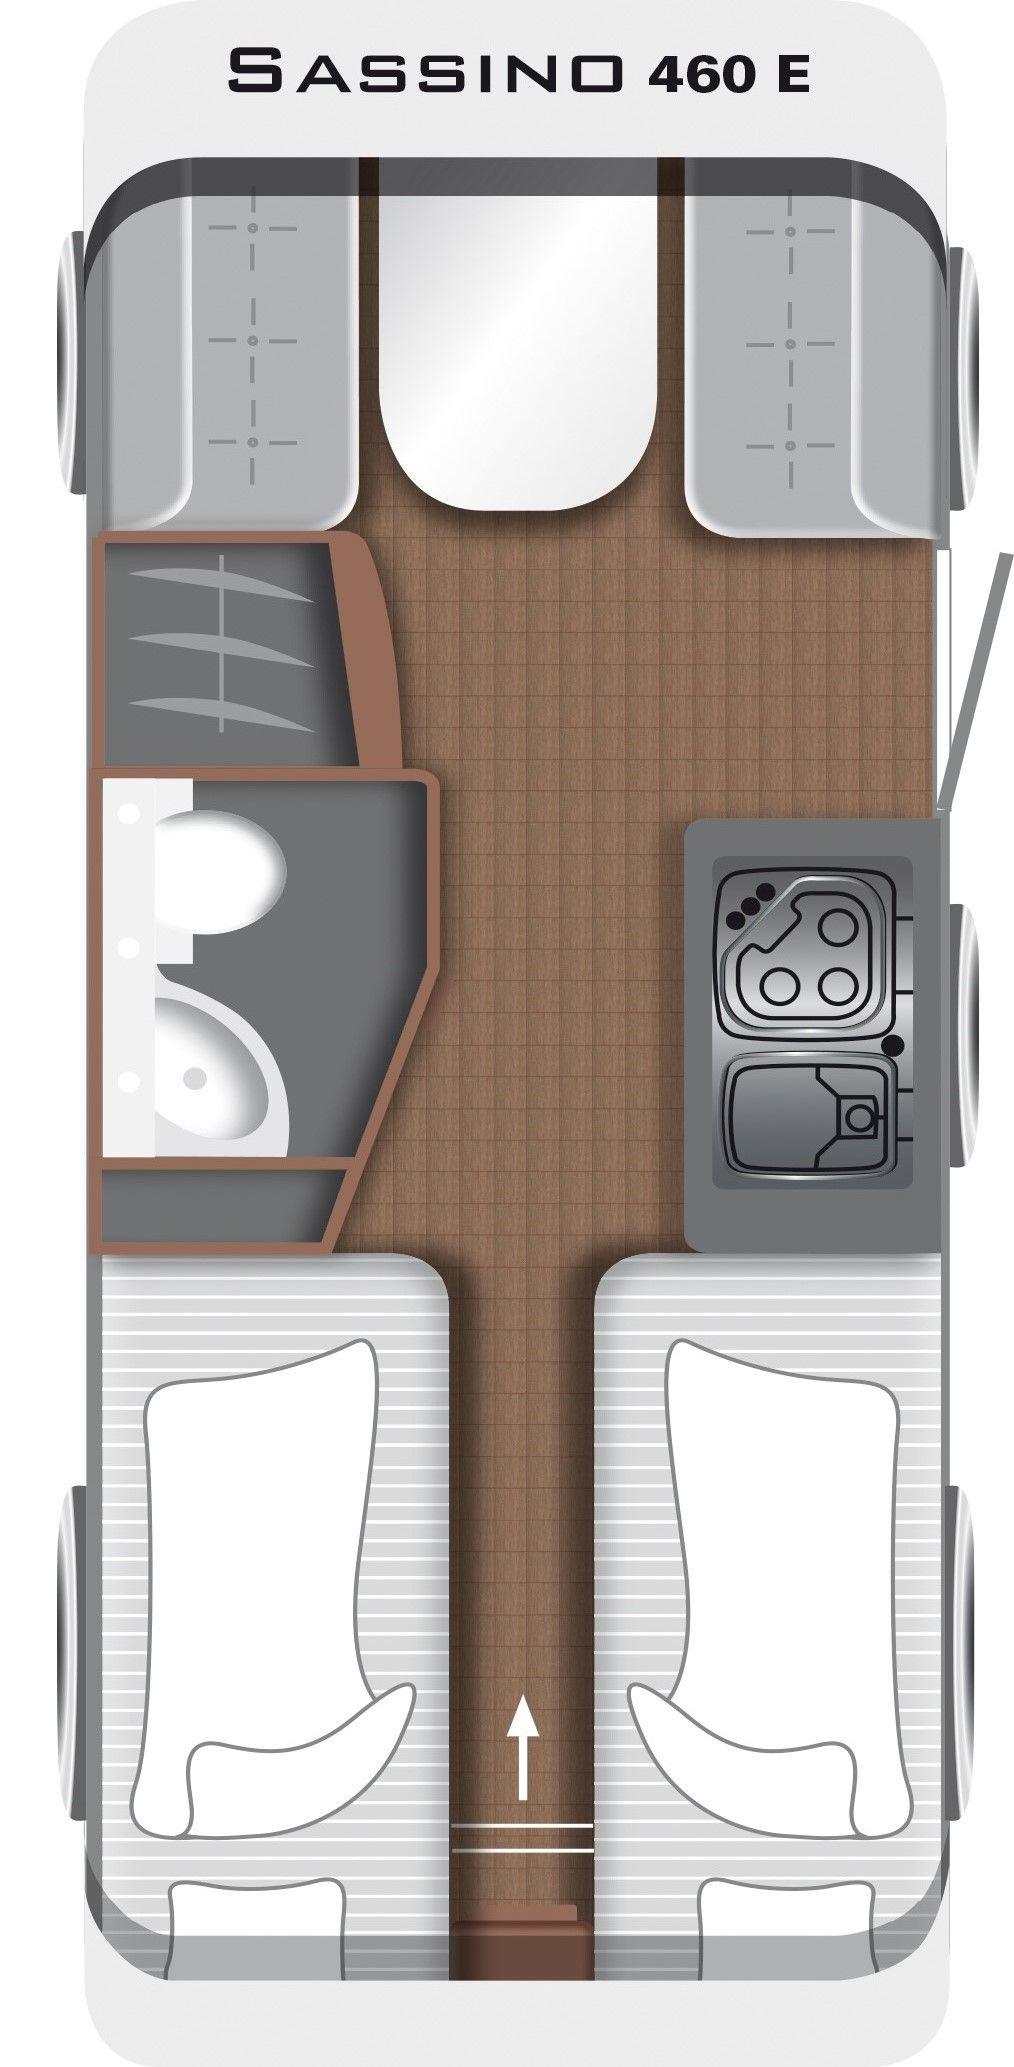 Sassino 460 E